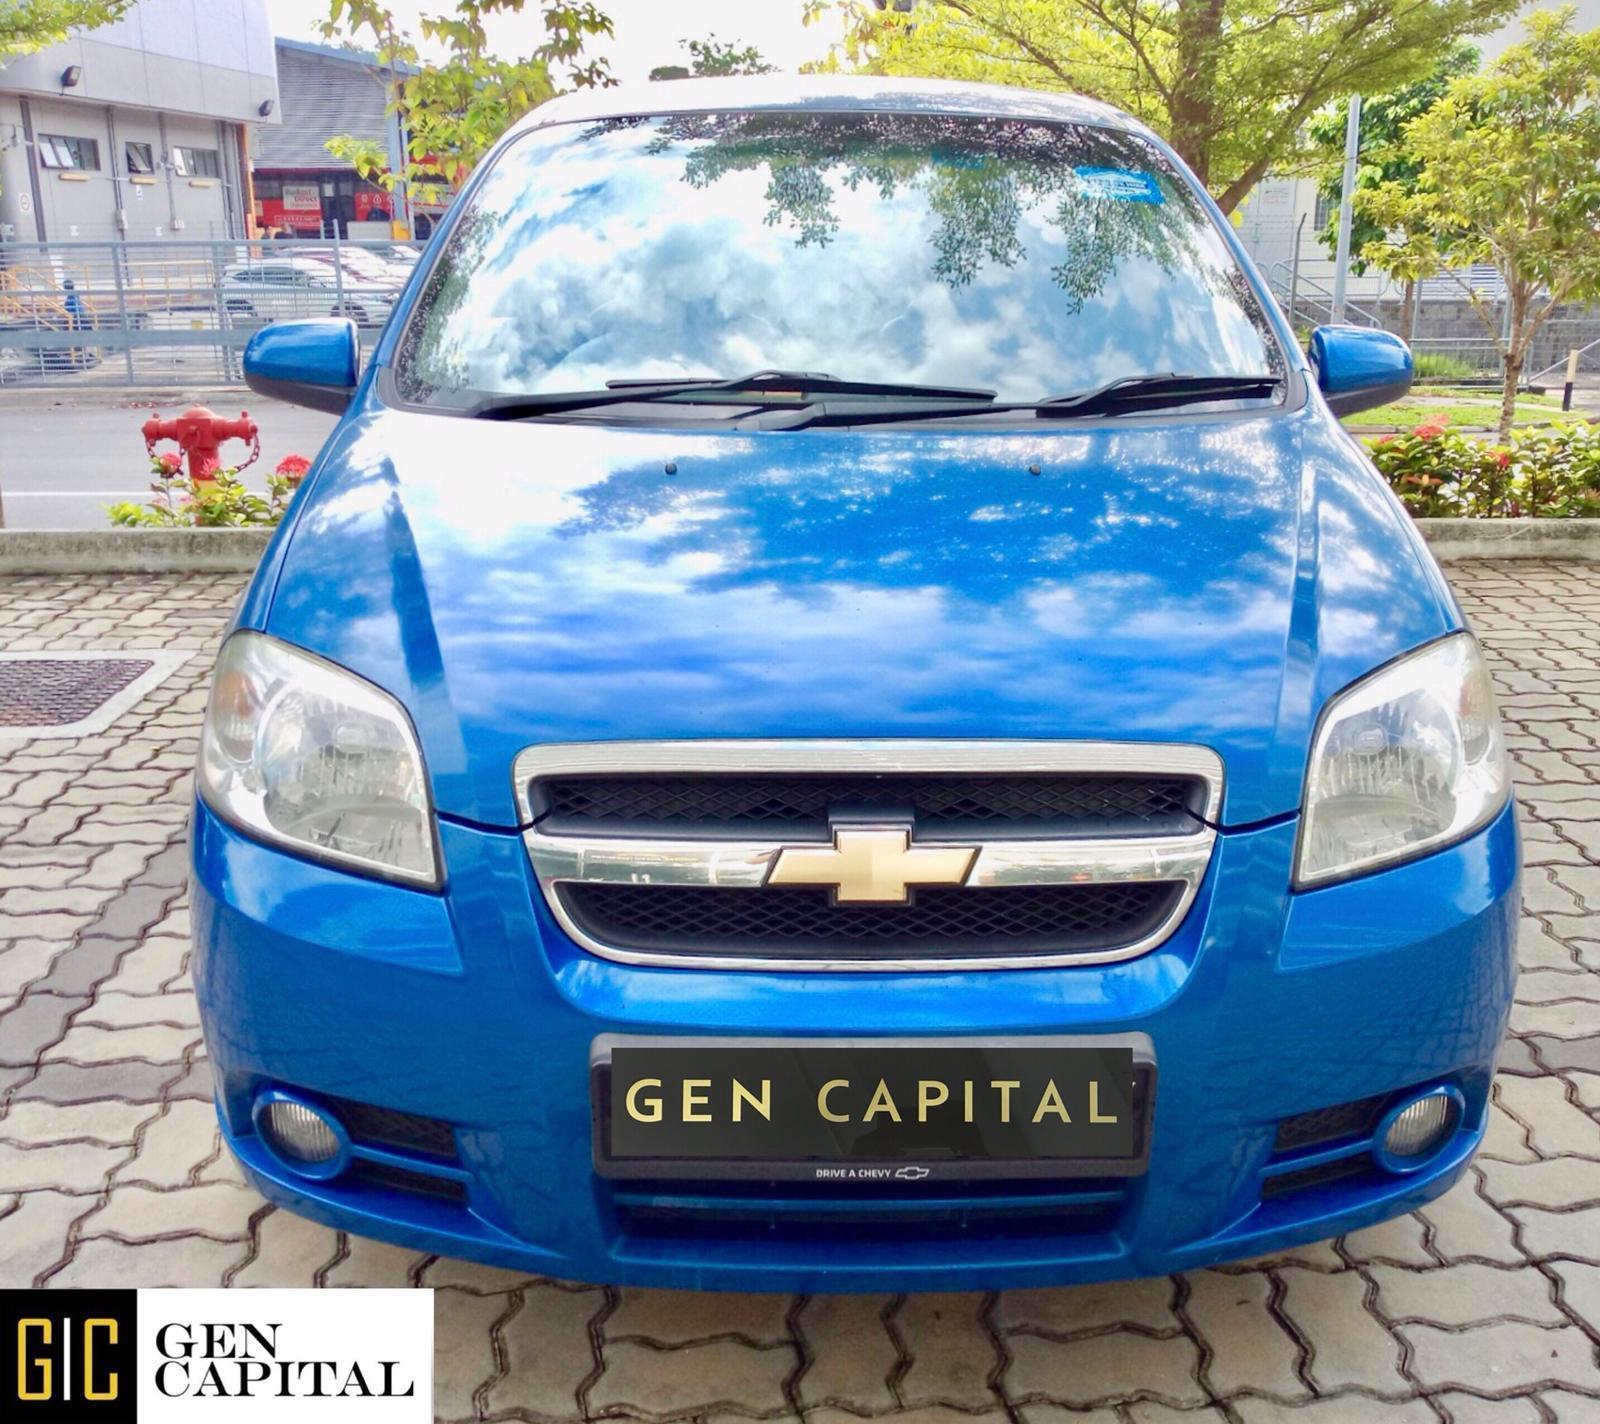 Chevrolet Aveo Sedan 1.4A @ Cheapest rates, full support!